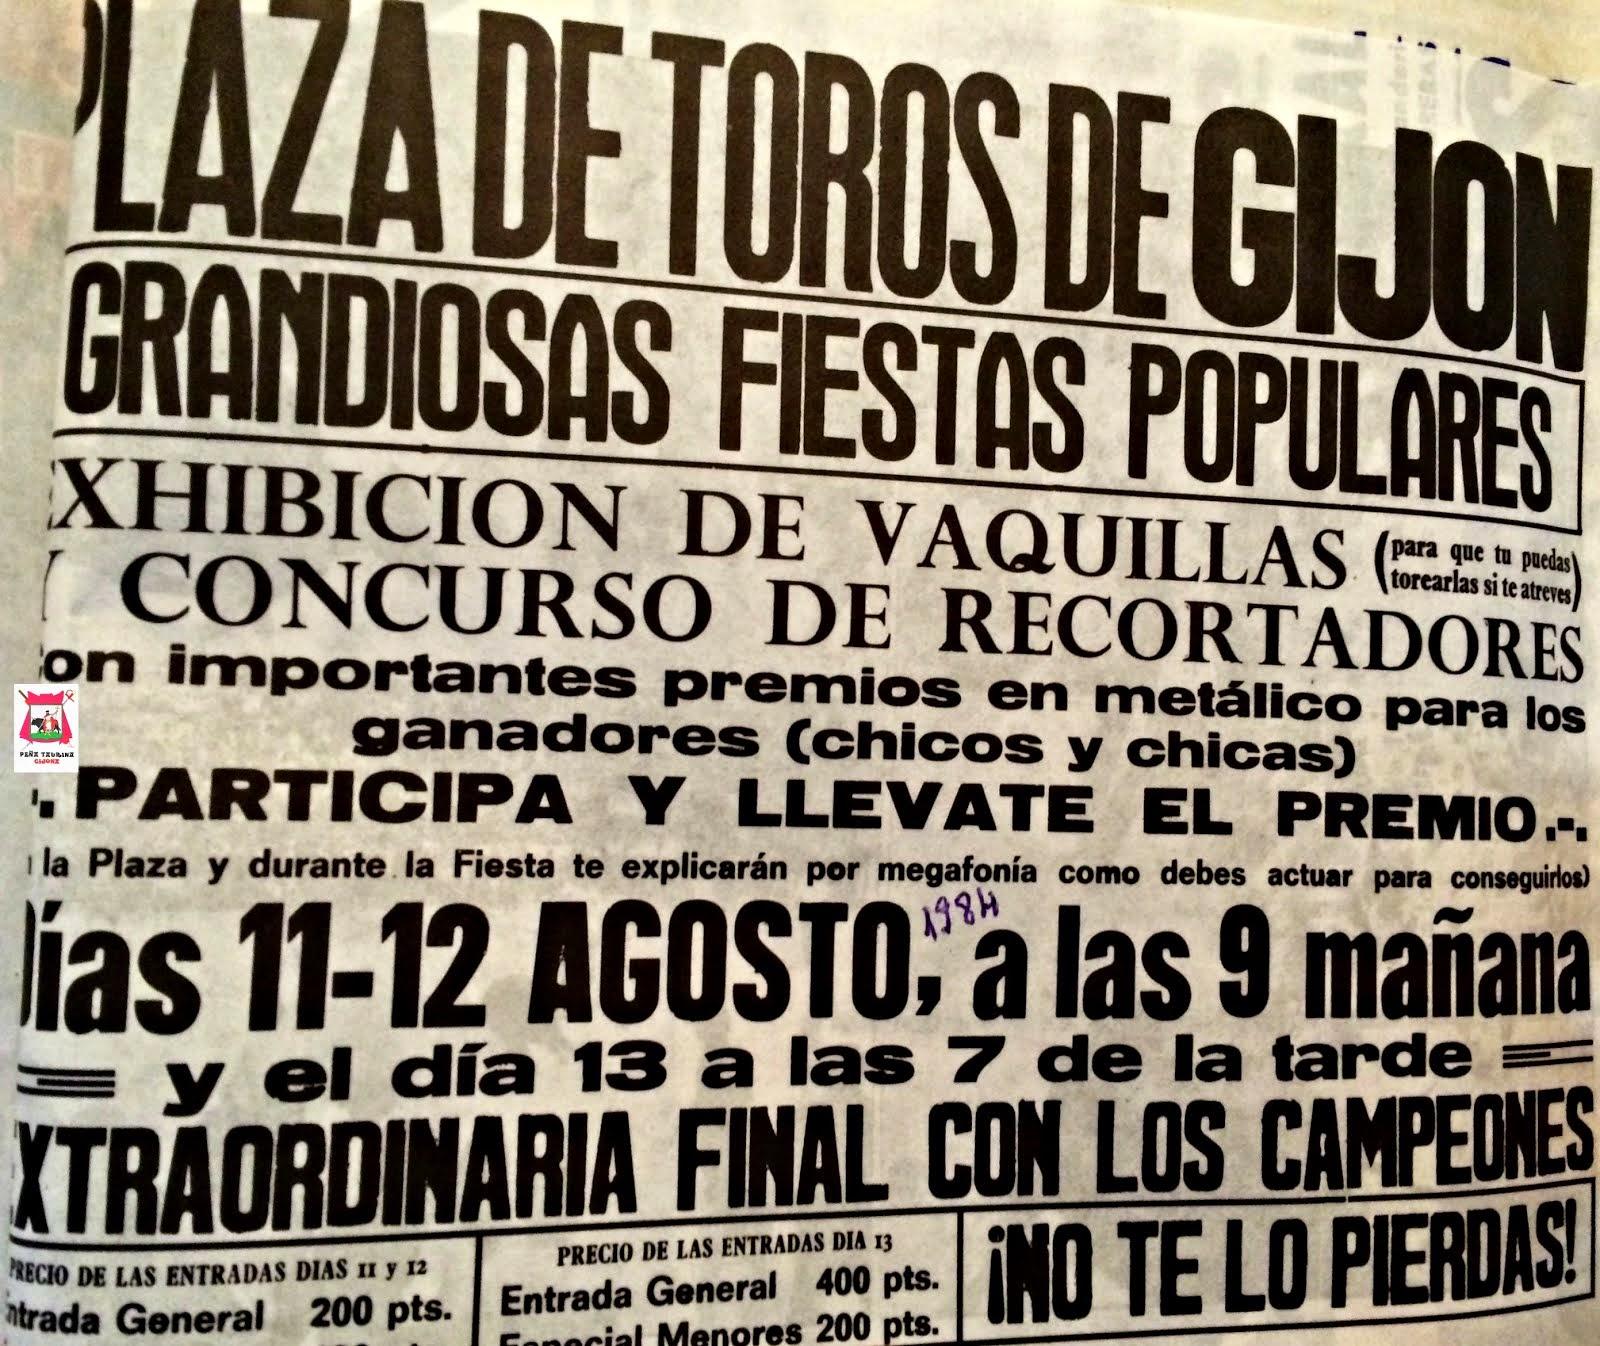 GIJON VAQUILLAS 1984